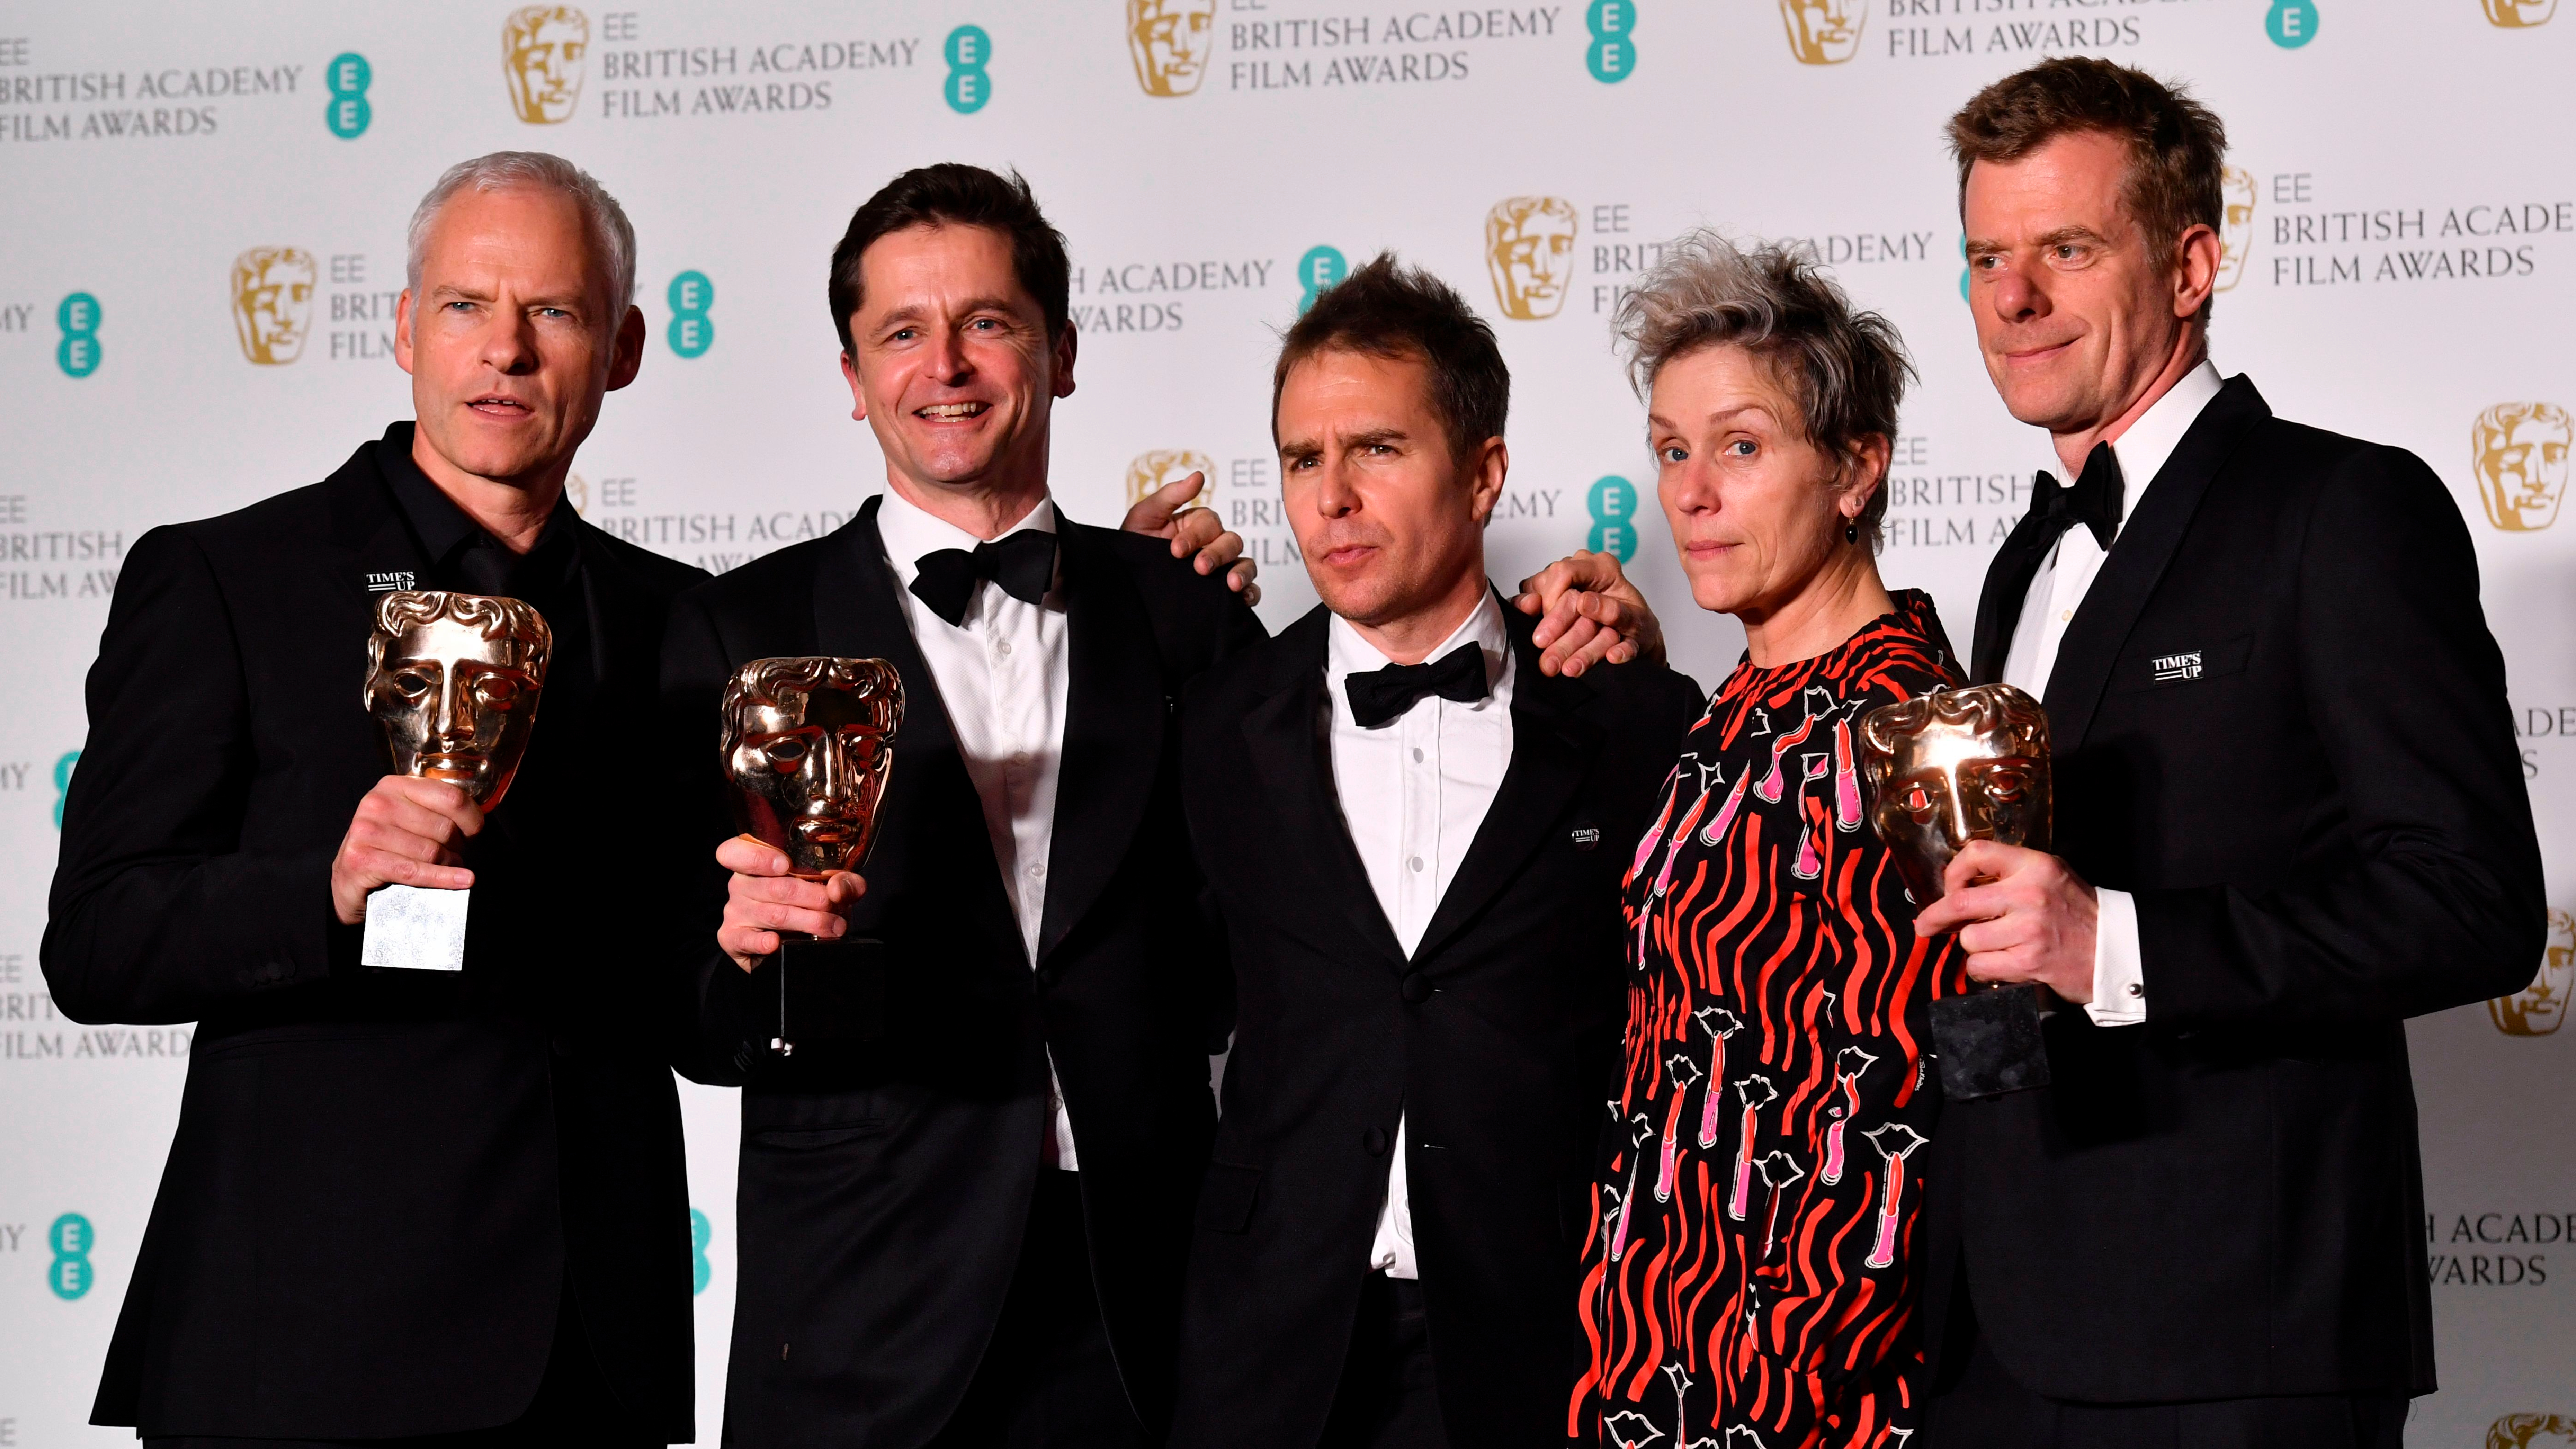 Baftas 2018: Three Billboards wins Best Film, Guillermo del Toro is Best Director